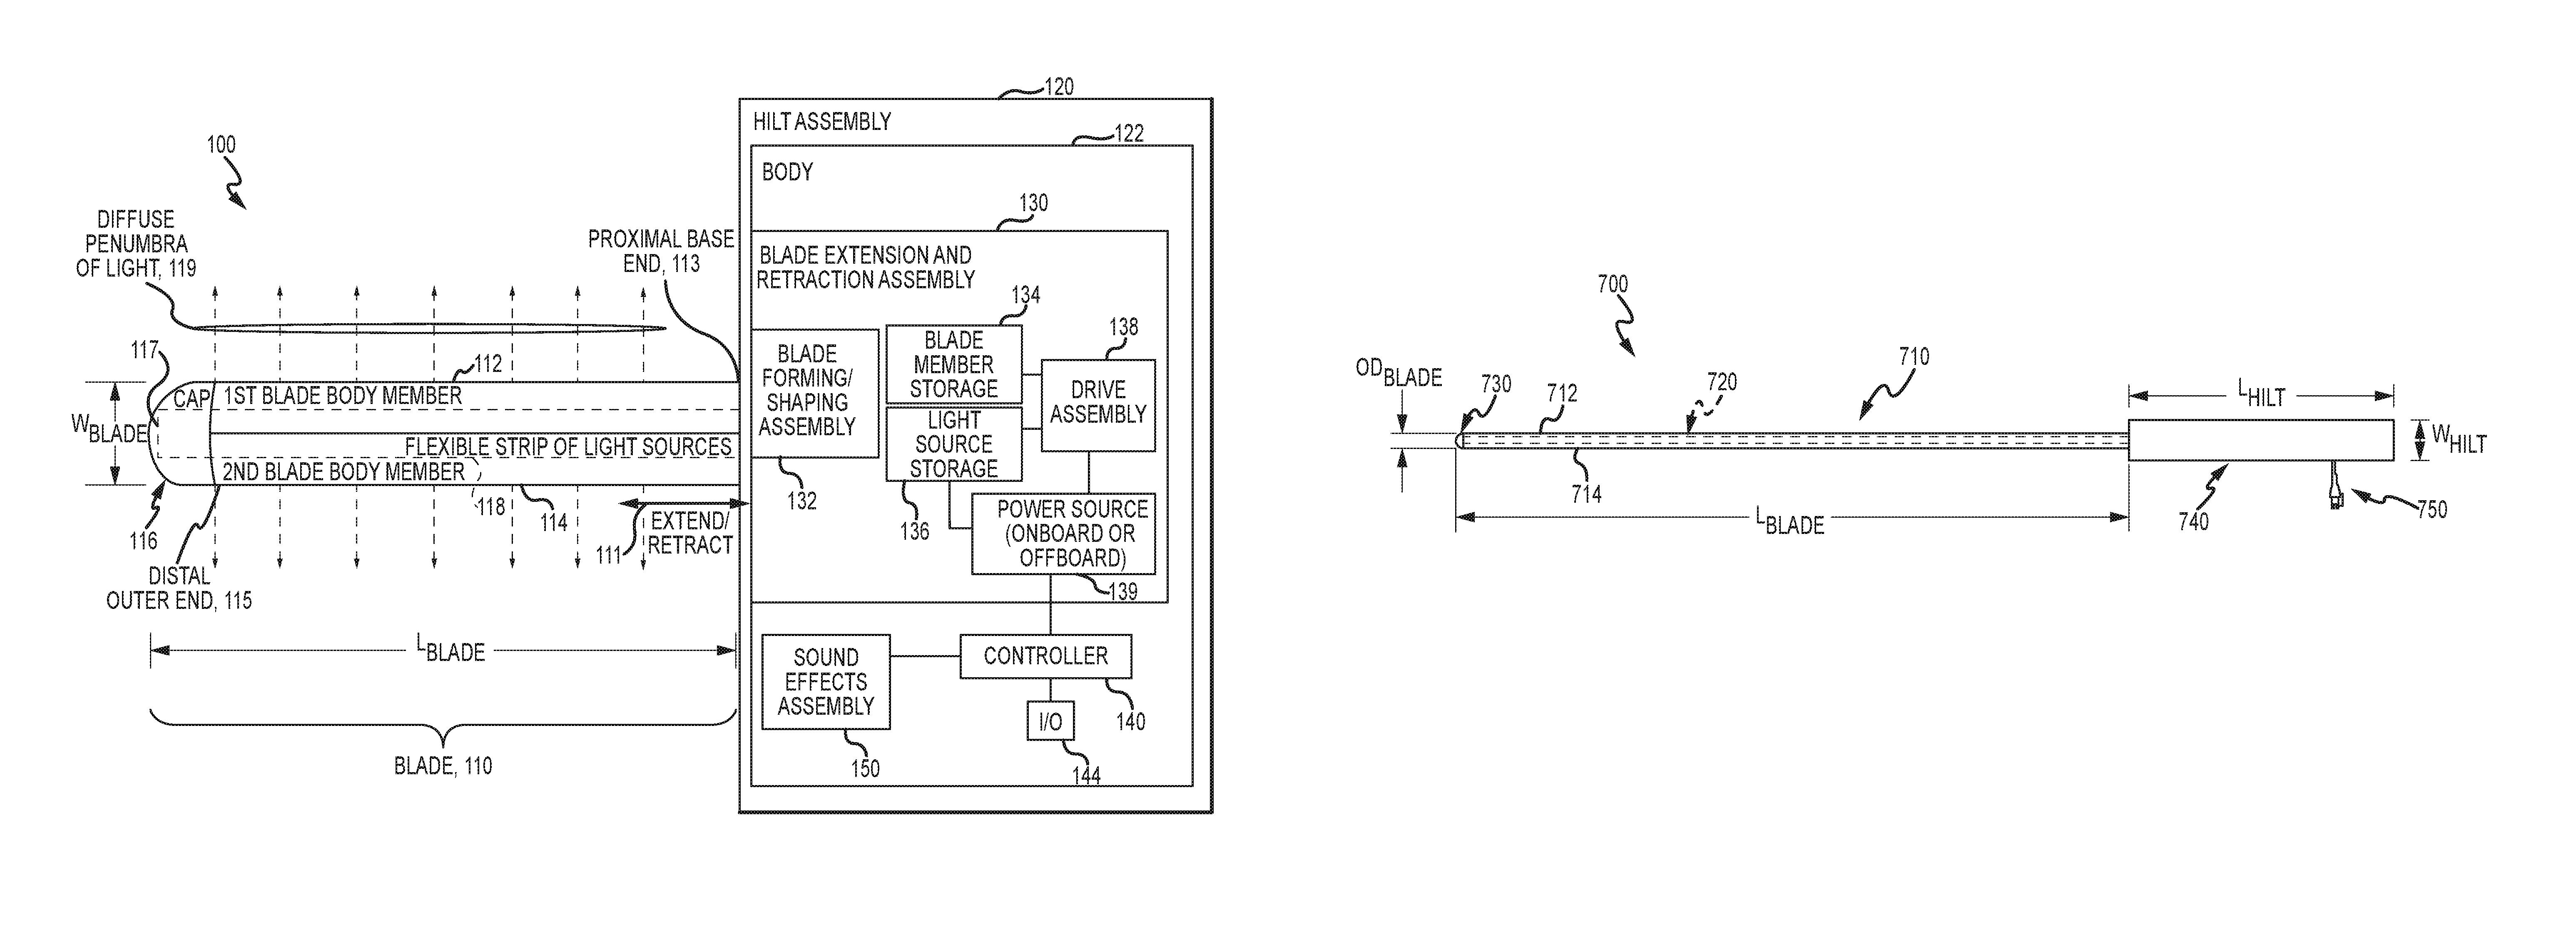 Disney Lightsaber Patent US10065127B1